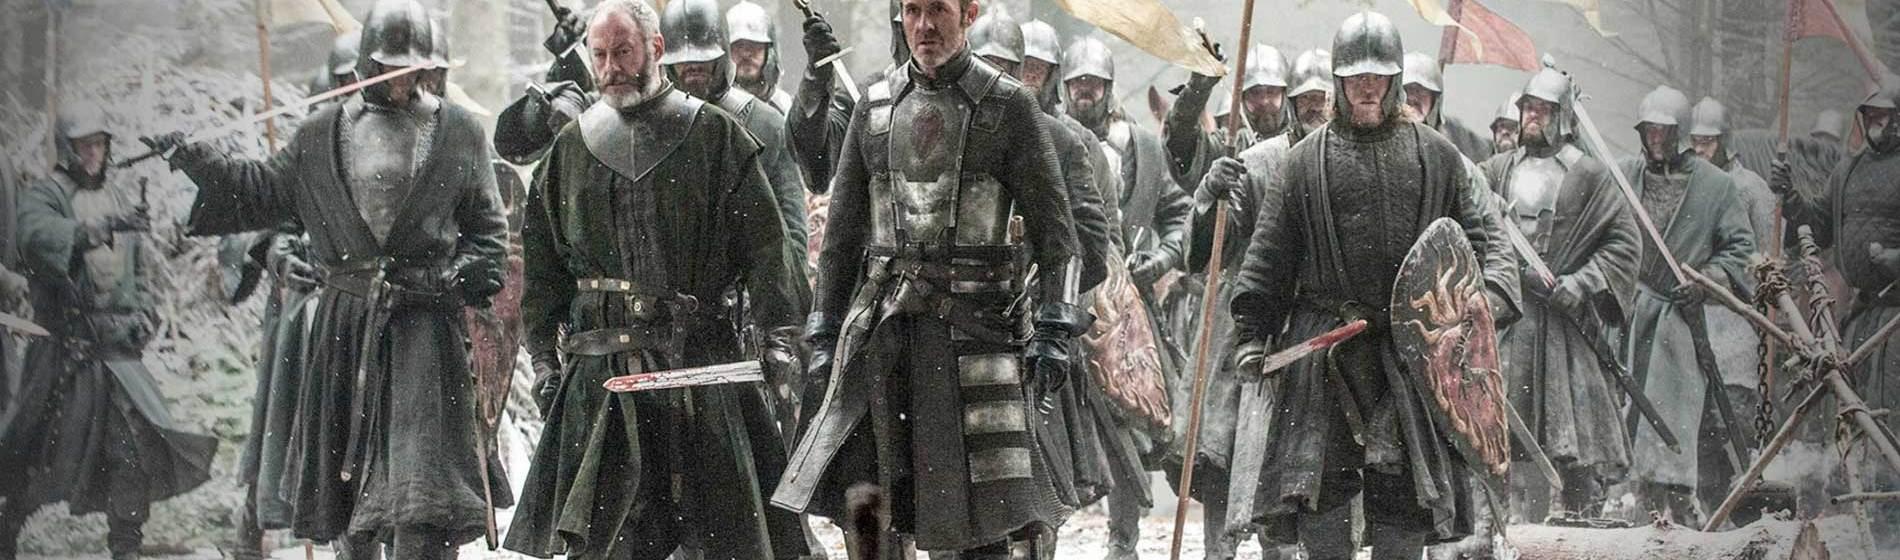 Game of Thrones - Season 4 Episode 10 - Stannis